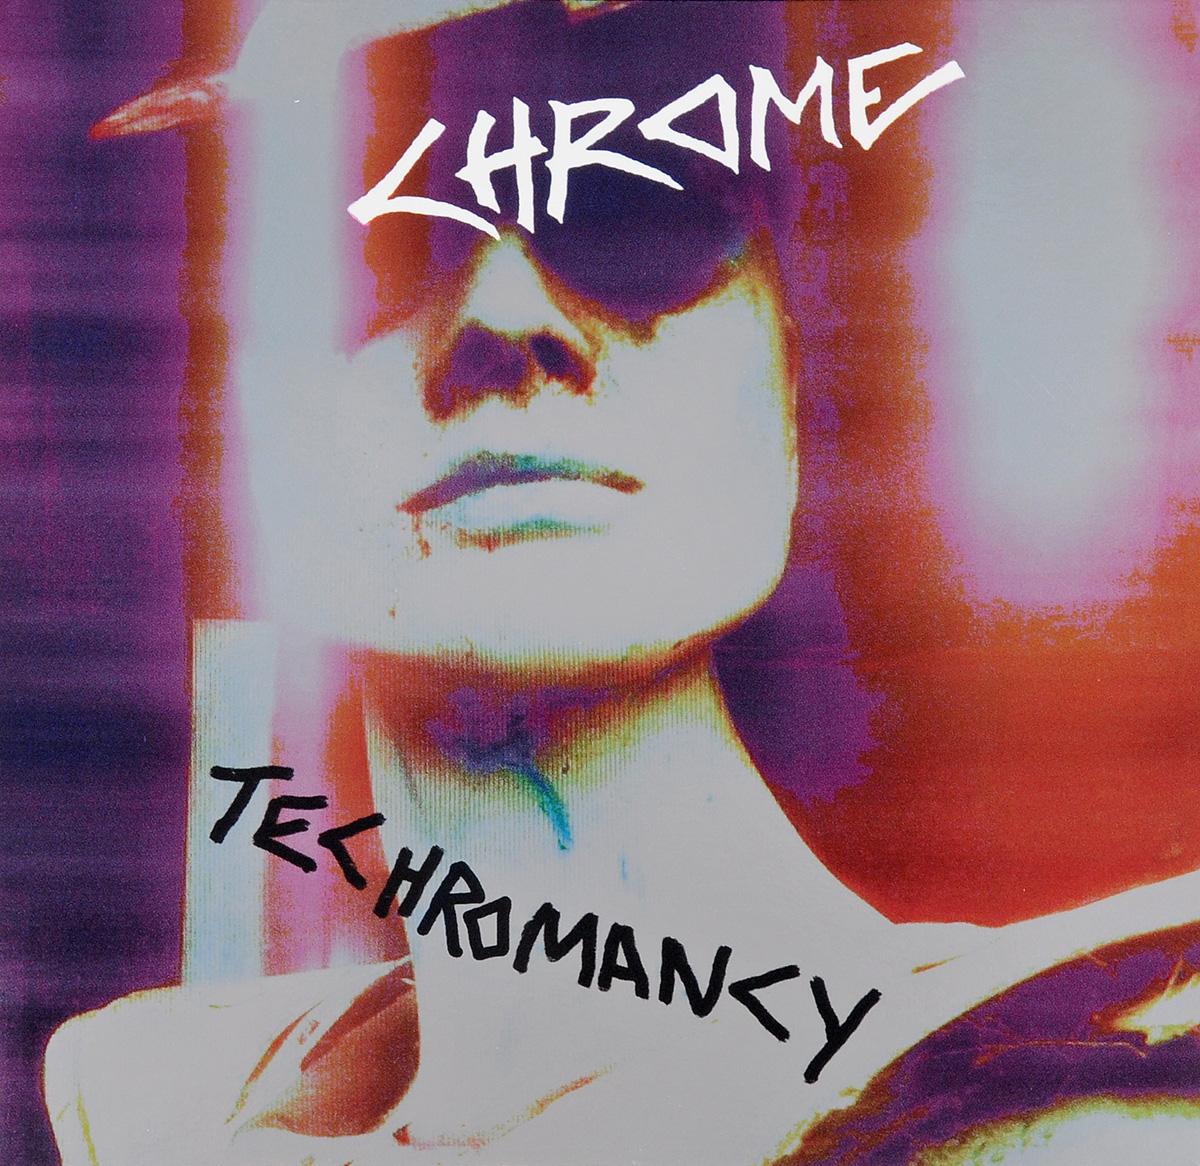 Chrome Chrome. Techromancy haiba hb4813 chrome